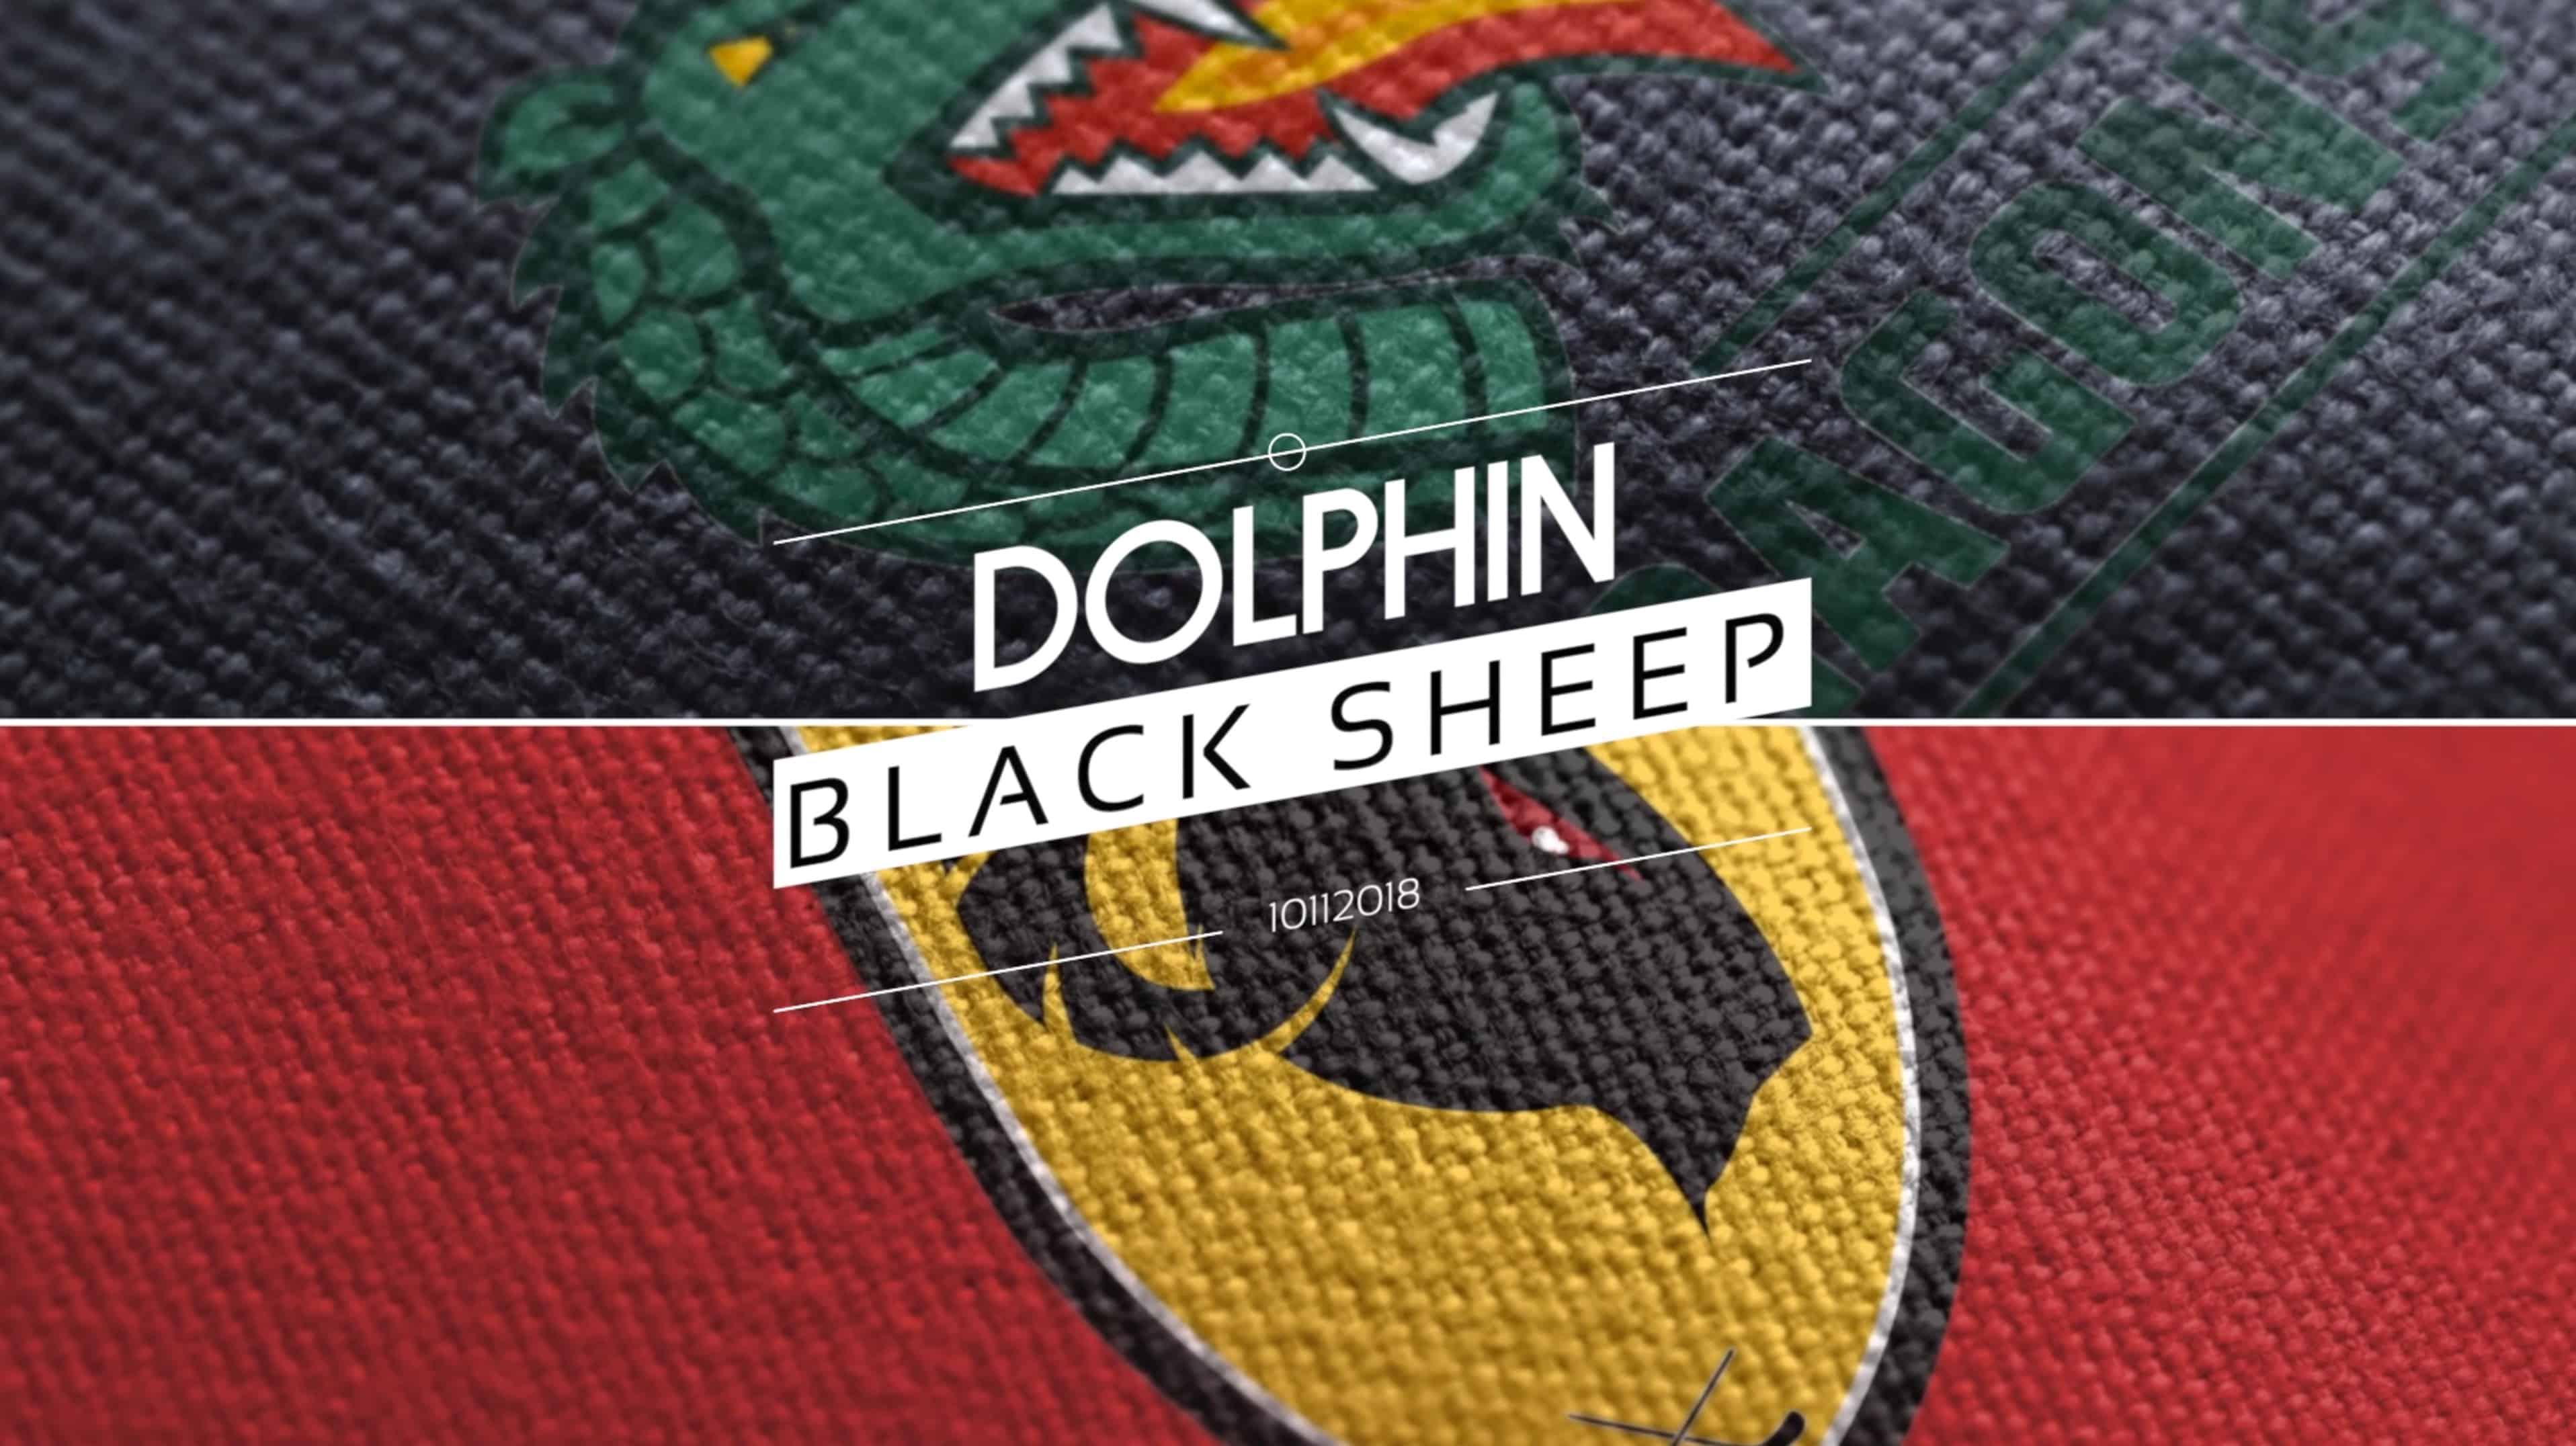 Dolphin versus Black Sheep 10112018